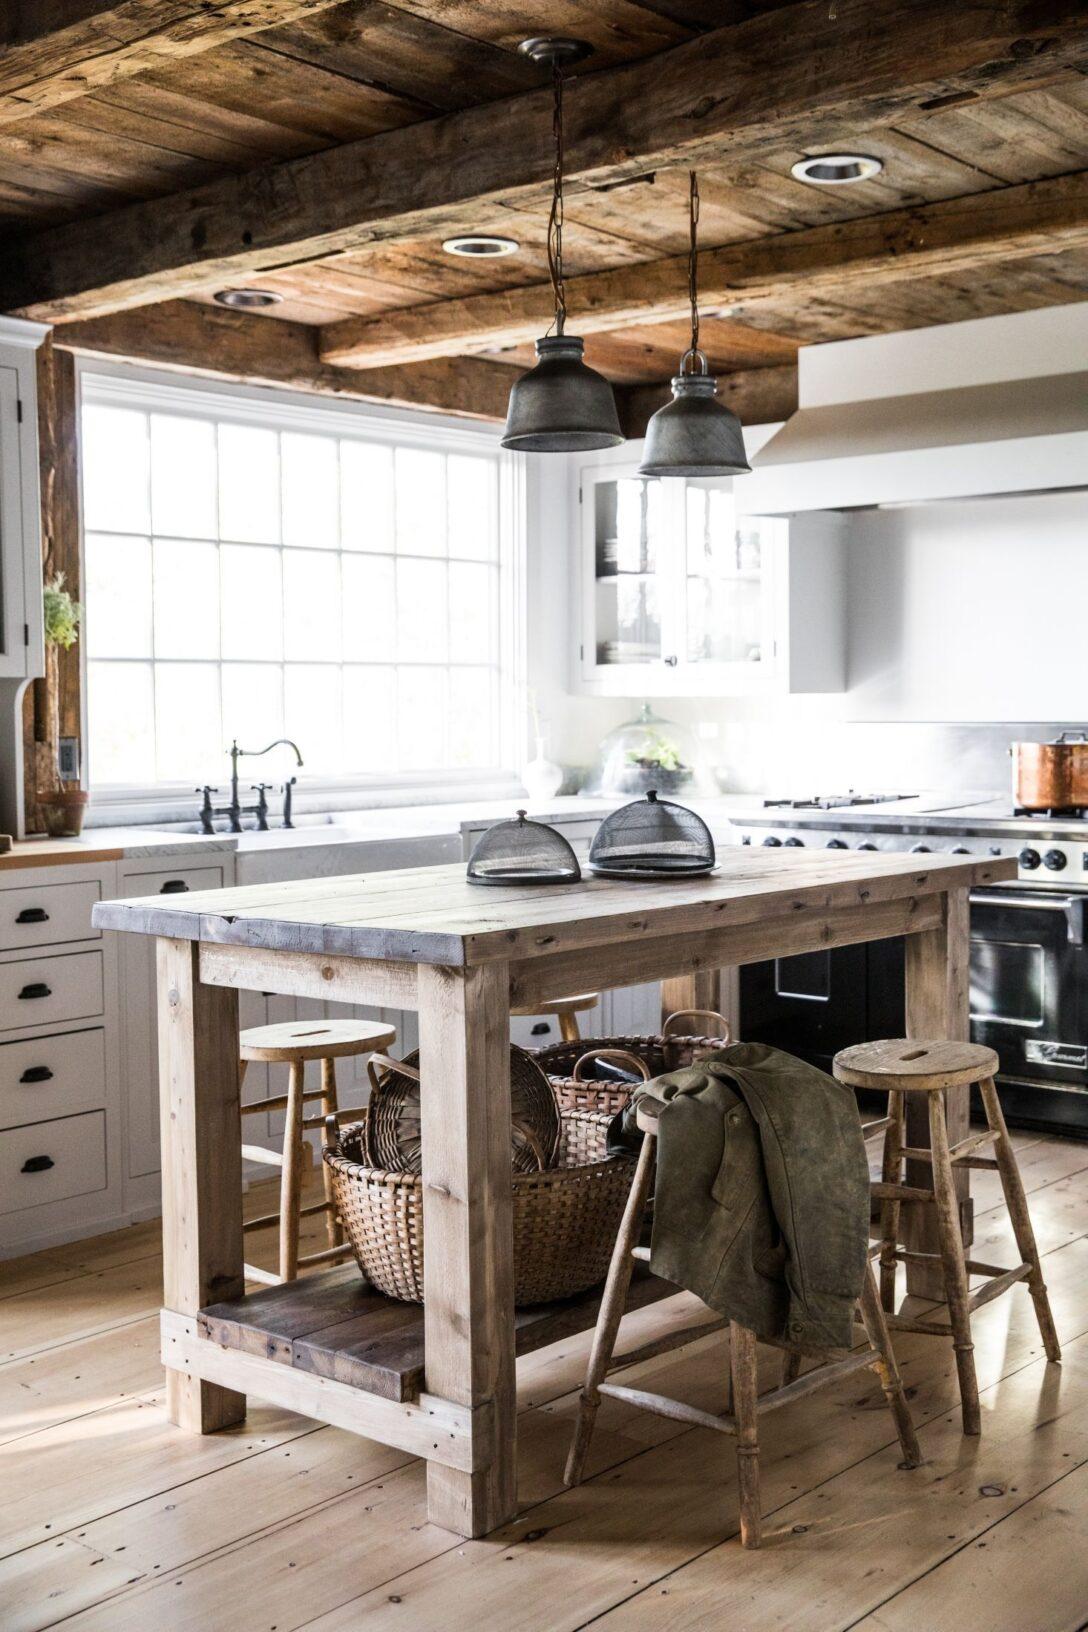 Large Size of Küchen Rustikal Recycled Kitchen Countertop Ideas Countertopsideas Küche Esstisch Holz Rustikaler Rustikales Bett Regal Wohnzimmer Küchen Rustikal